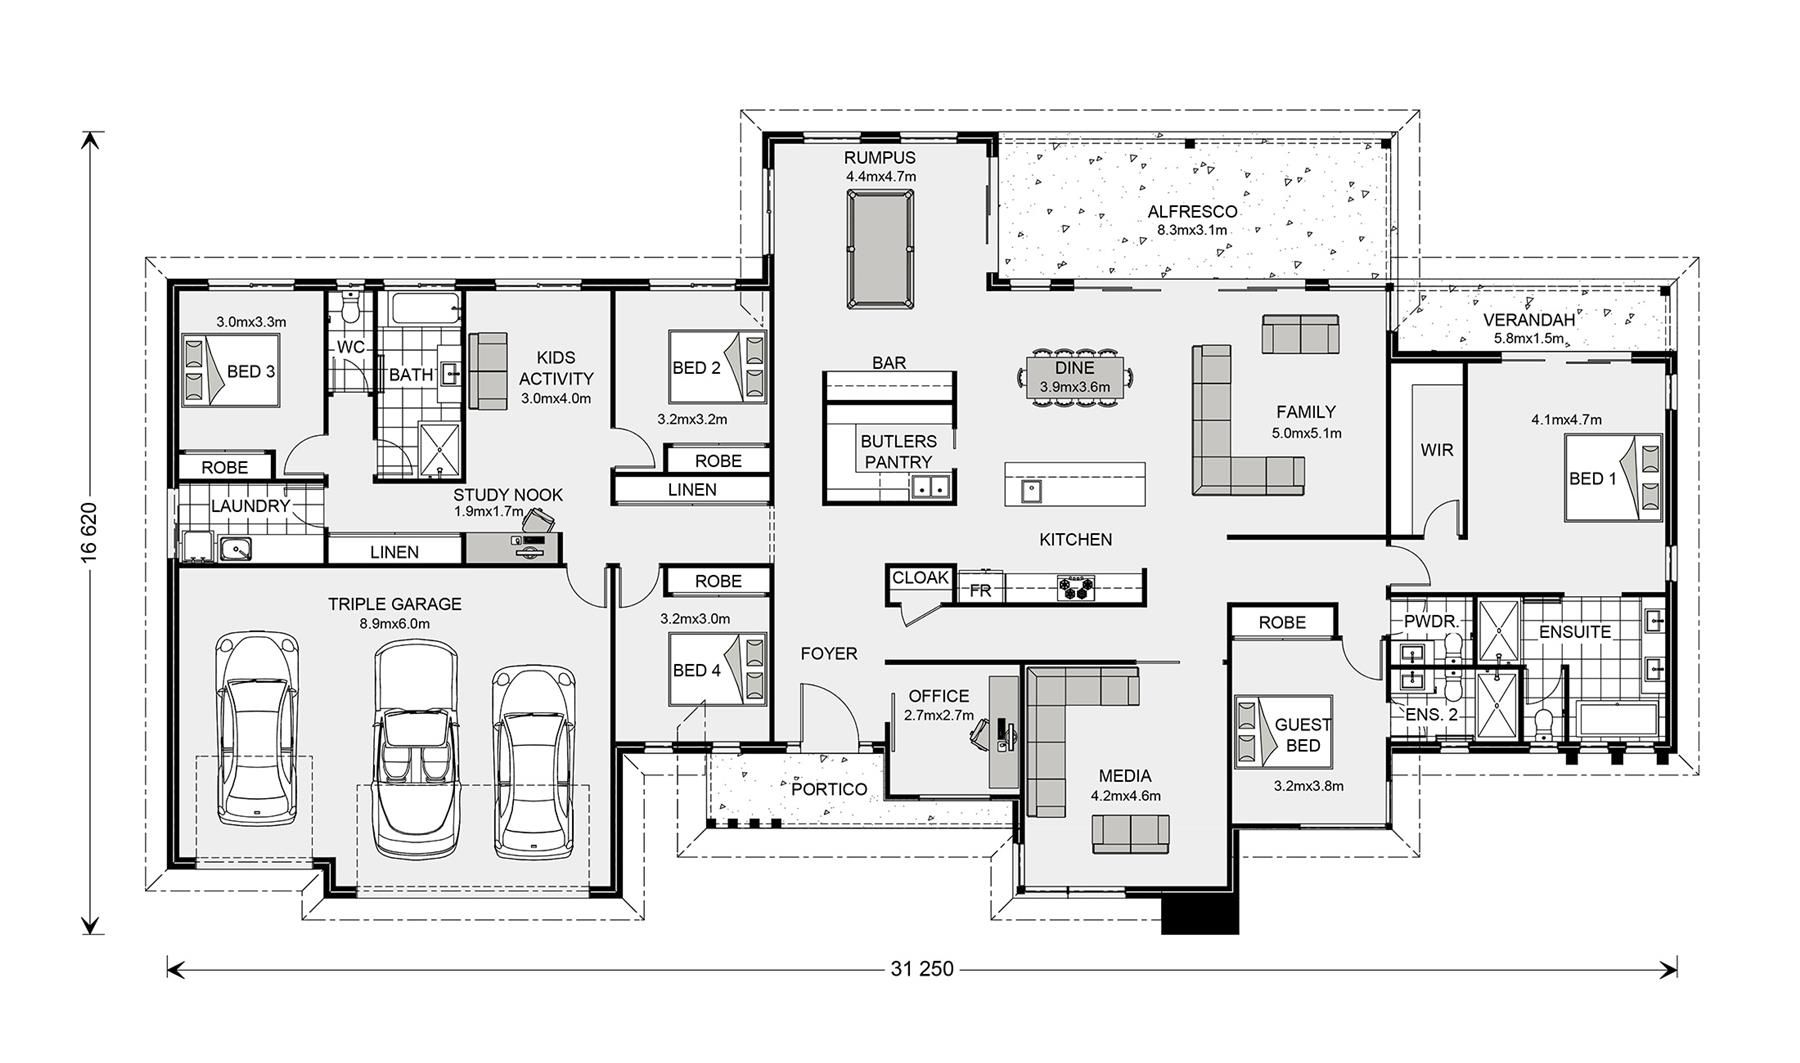 Somerset 513 Home Designs In G J Gardner Homes House Plans House Design House Plans With Pictures